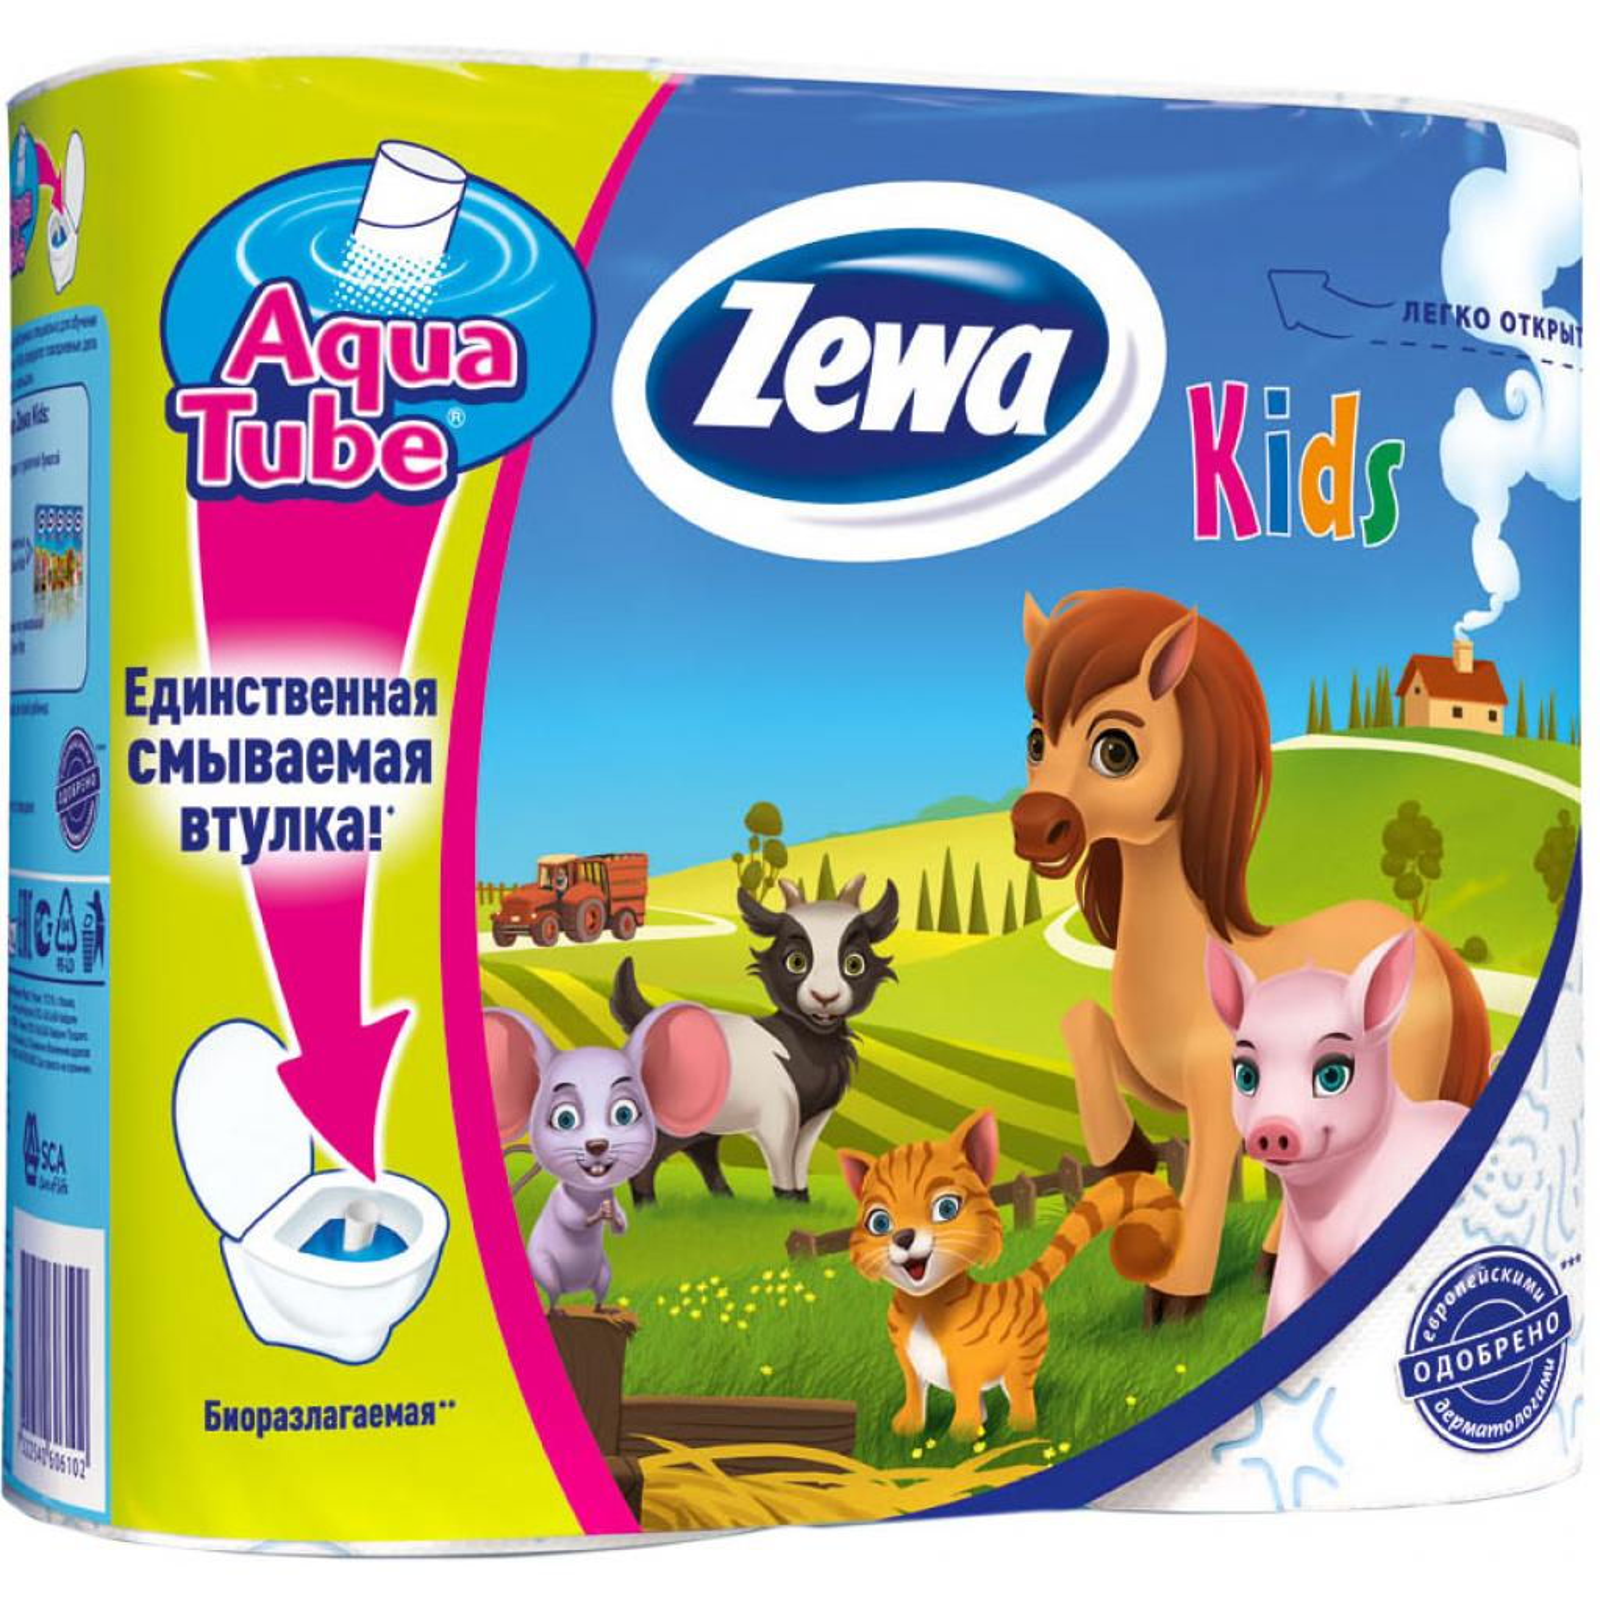 Туалетная бумага Zewa Kids 3-слойная 4 шт (7322540606102)